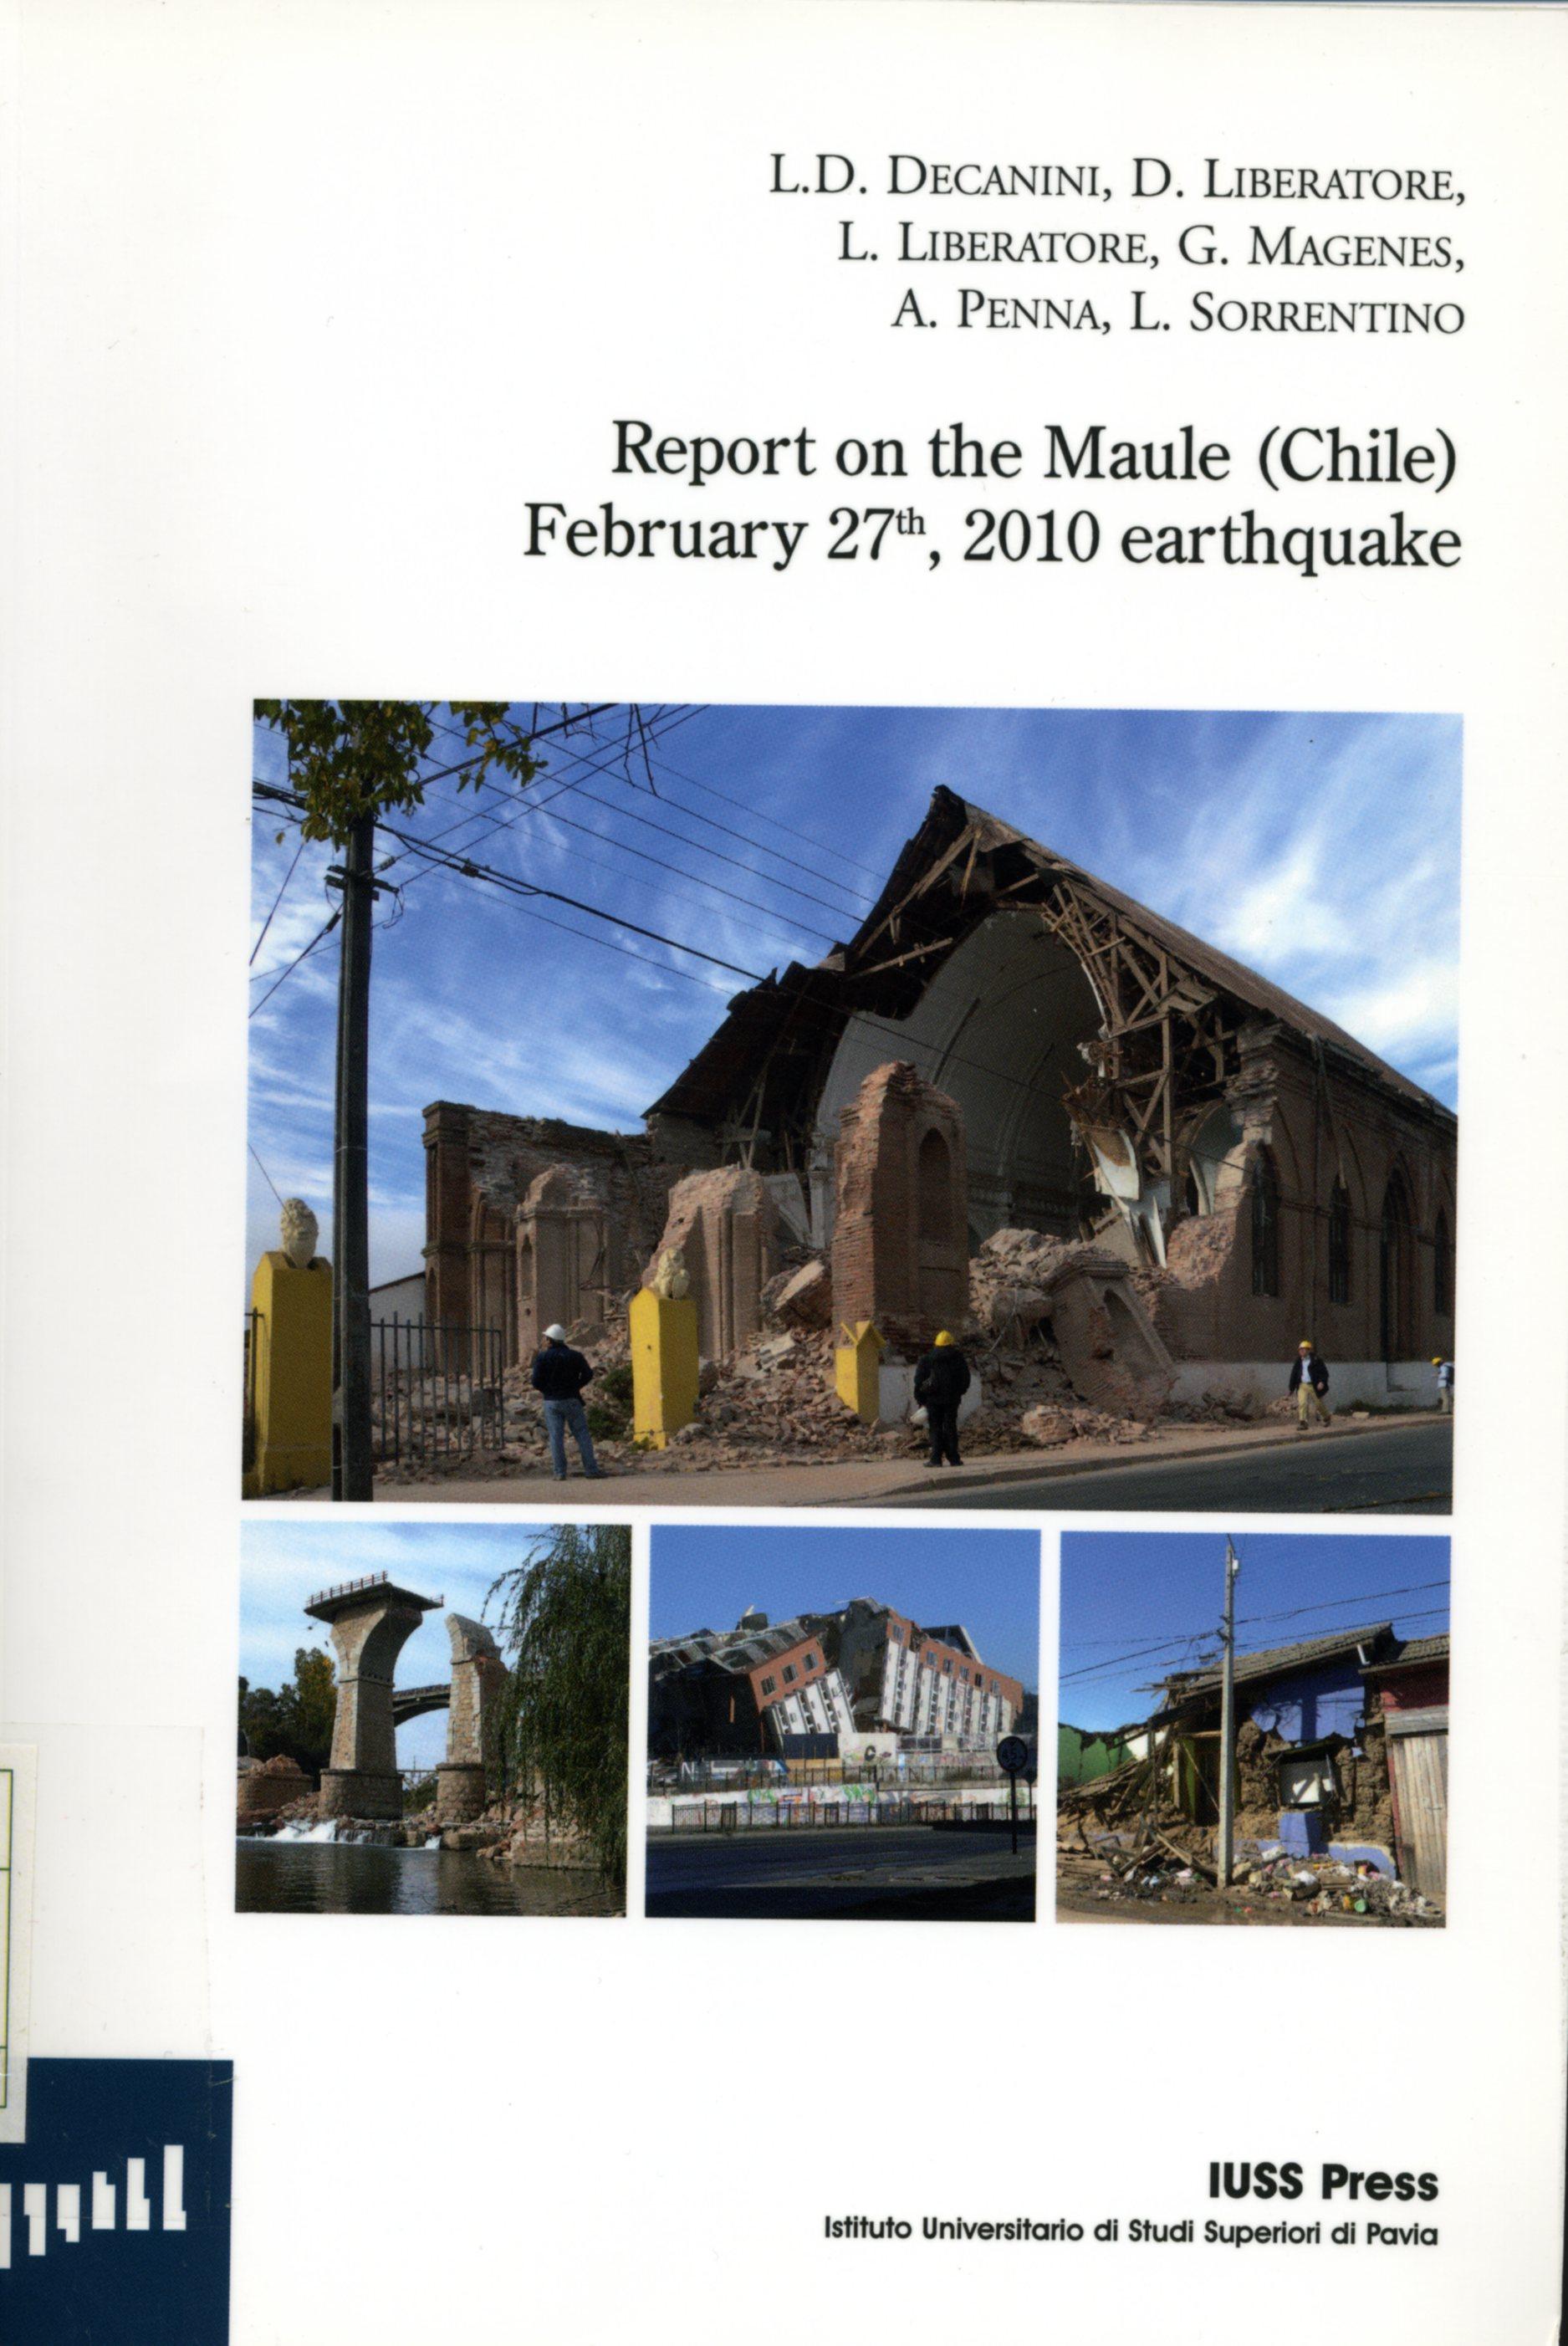 Report on the Maule (Chile) February 27th, 2010 Earthquake